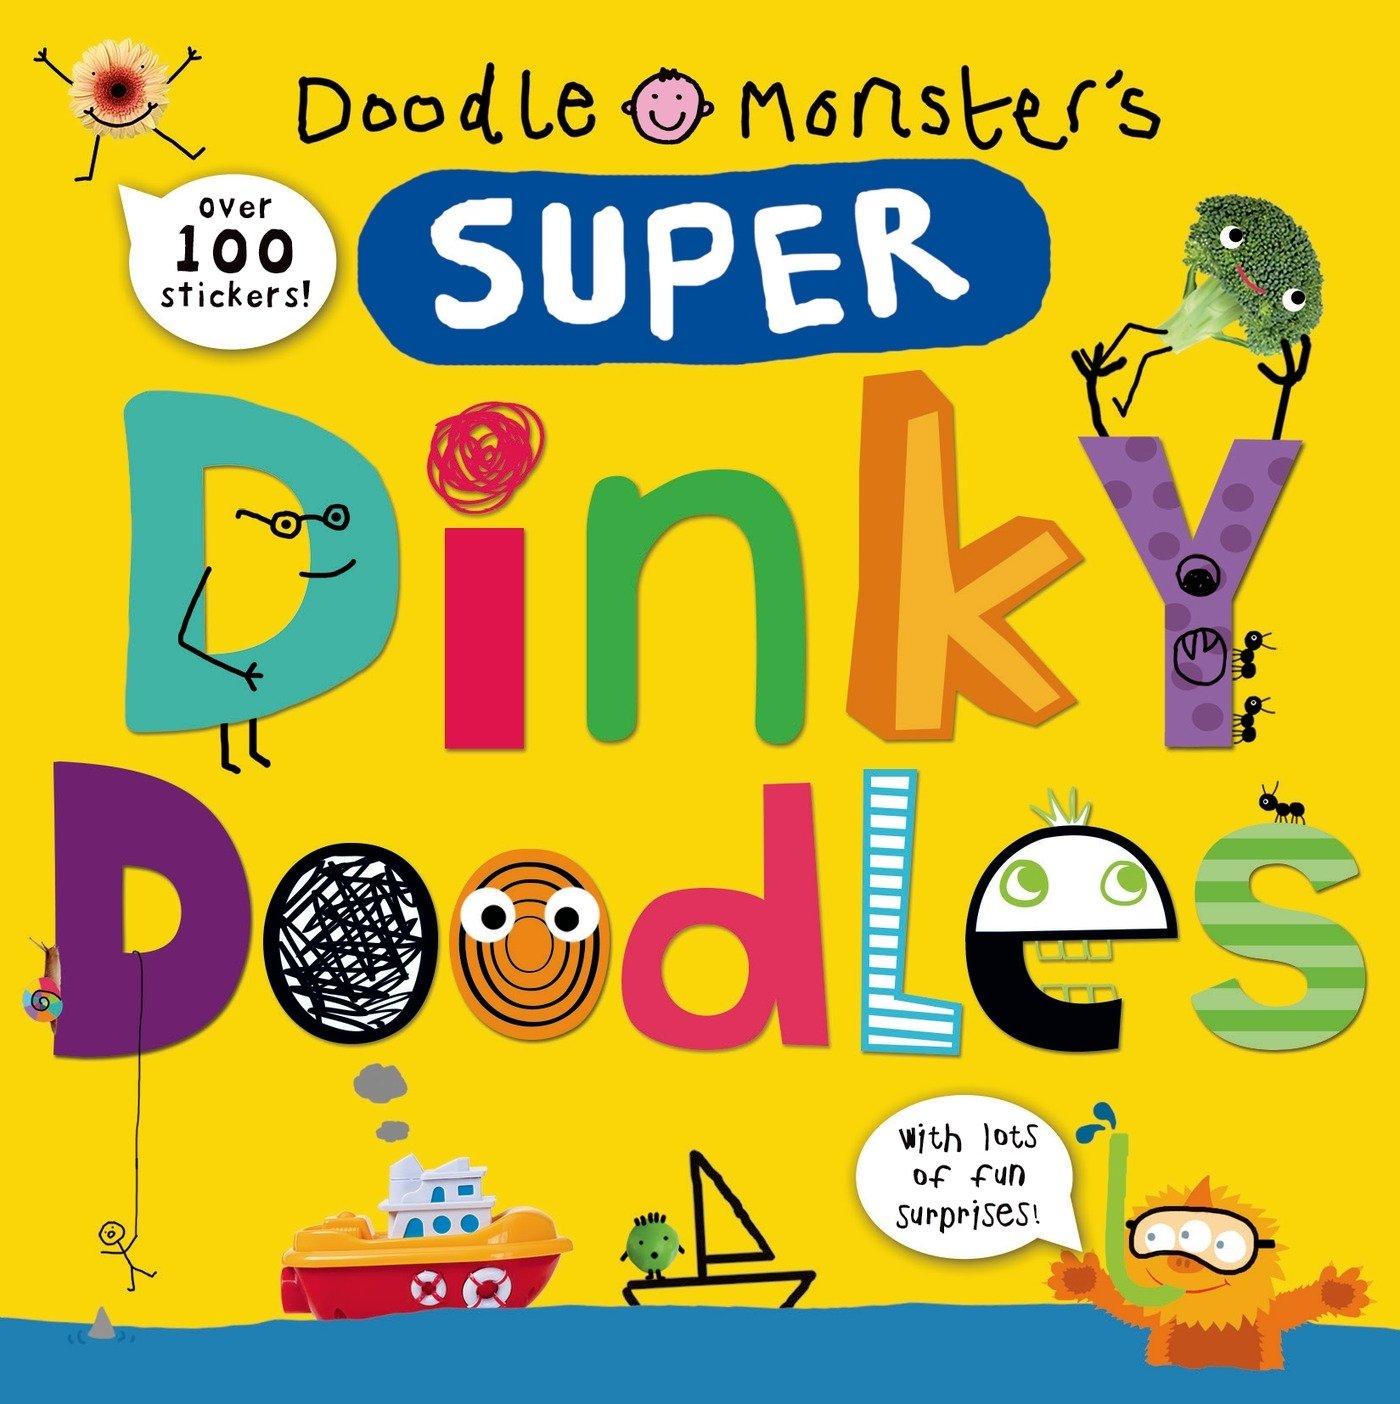 Super Dinky Doodles Stickers Surprises